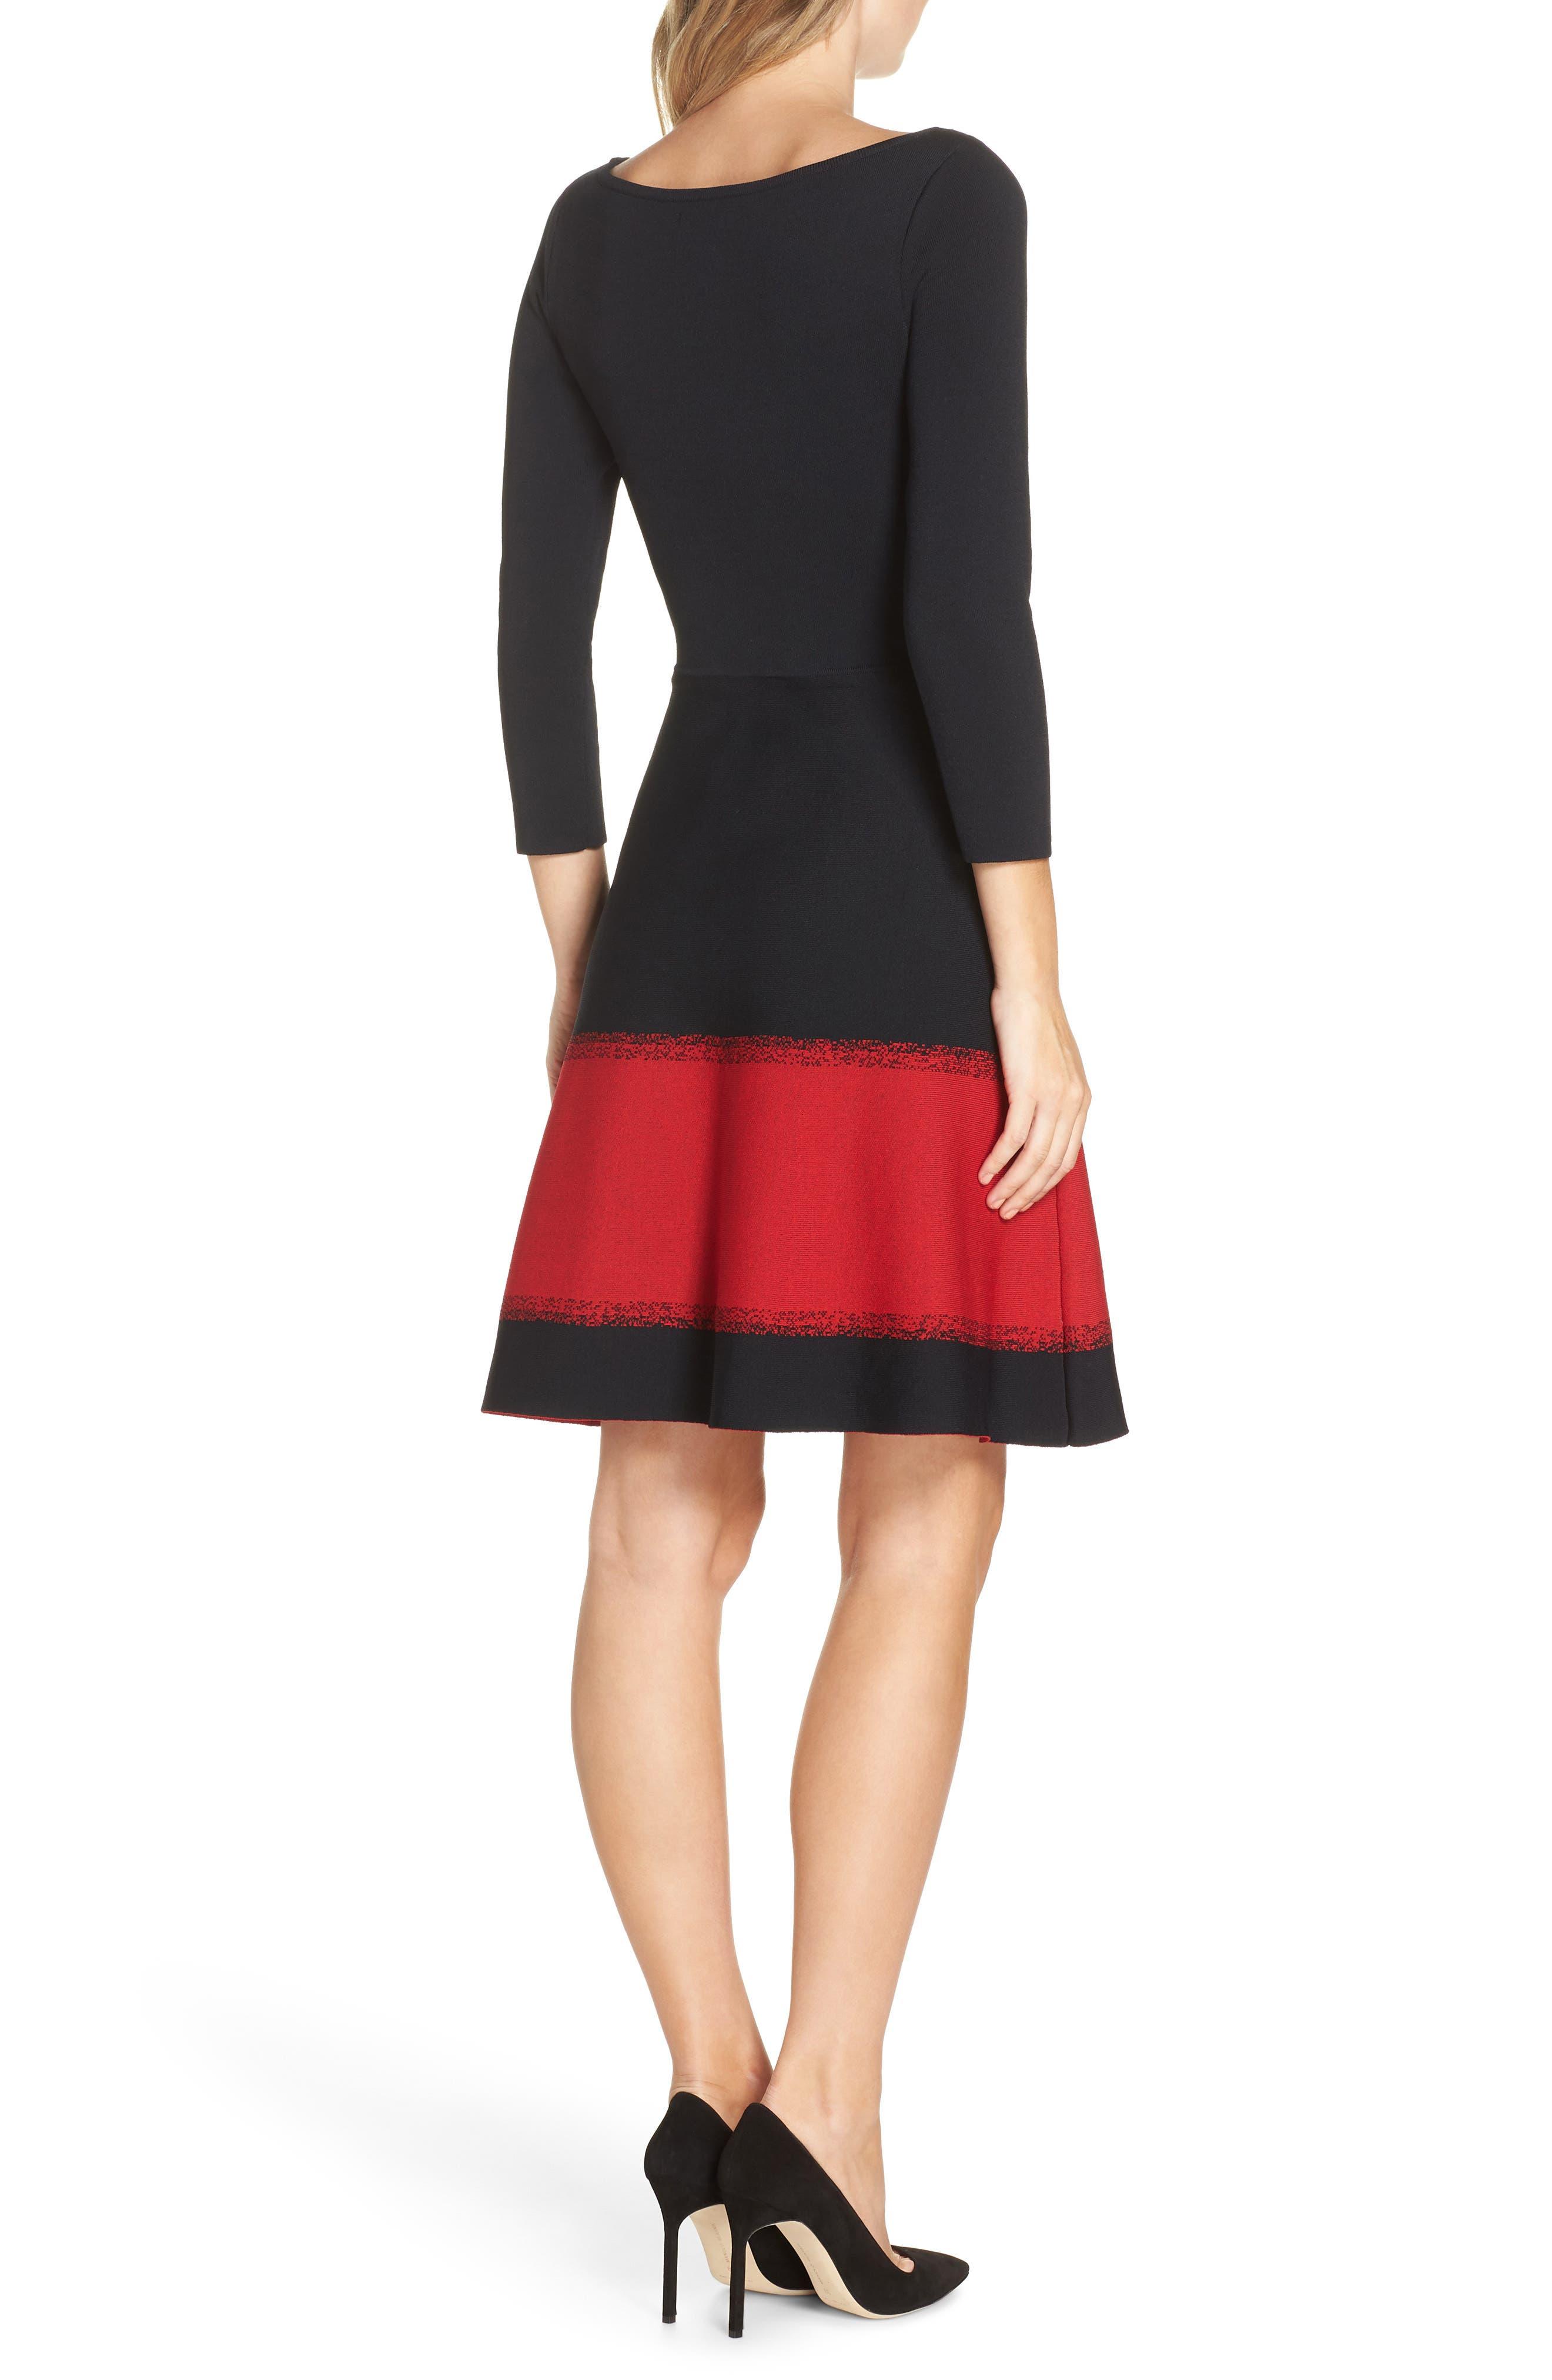 ELIZA J, Contrast Stripe Fit & Flare Dress, Alternate thumbnail 2, color, 001